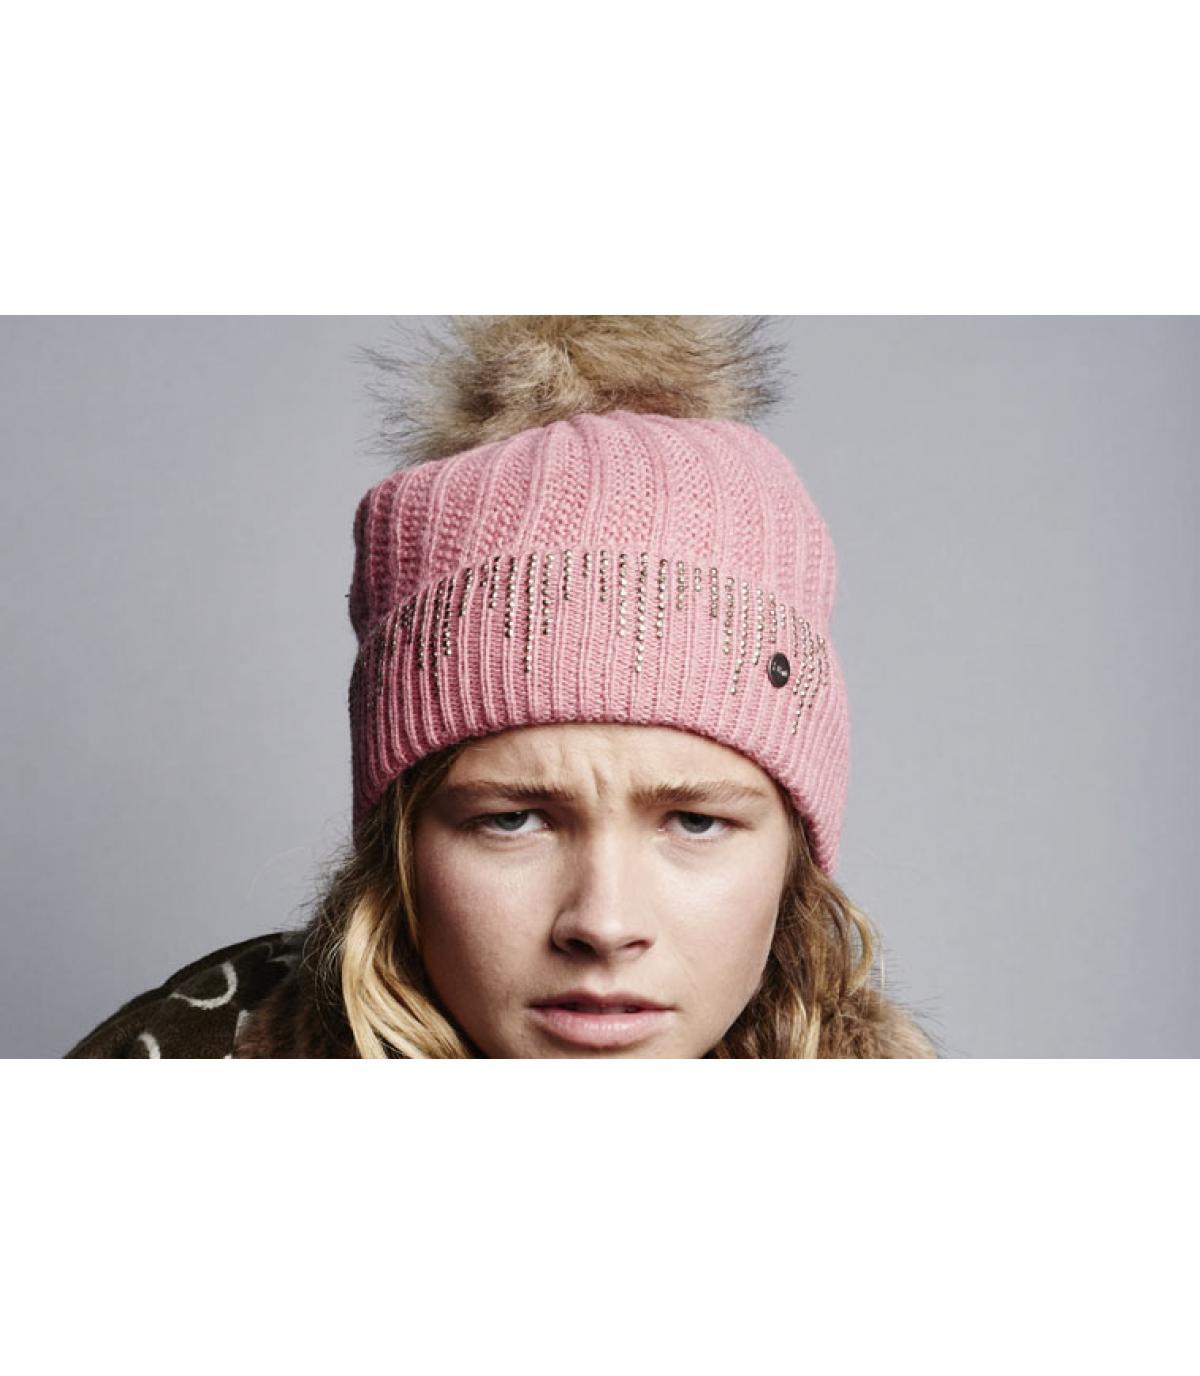 b7ce7d08d6c Rhinestones pom beanie - Marigold beanie blush by Barts. Headict